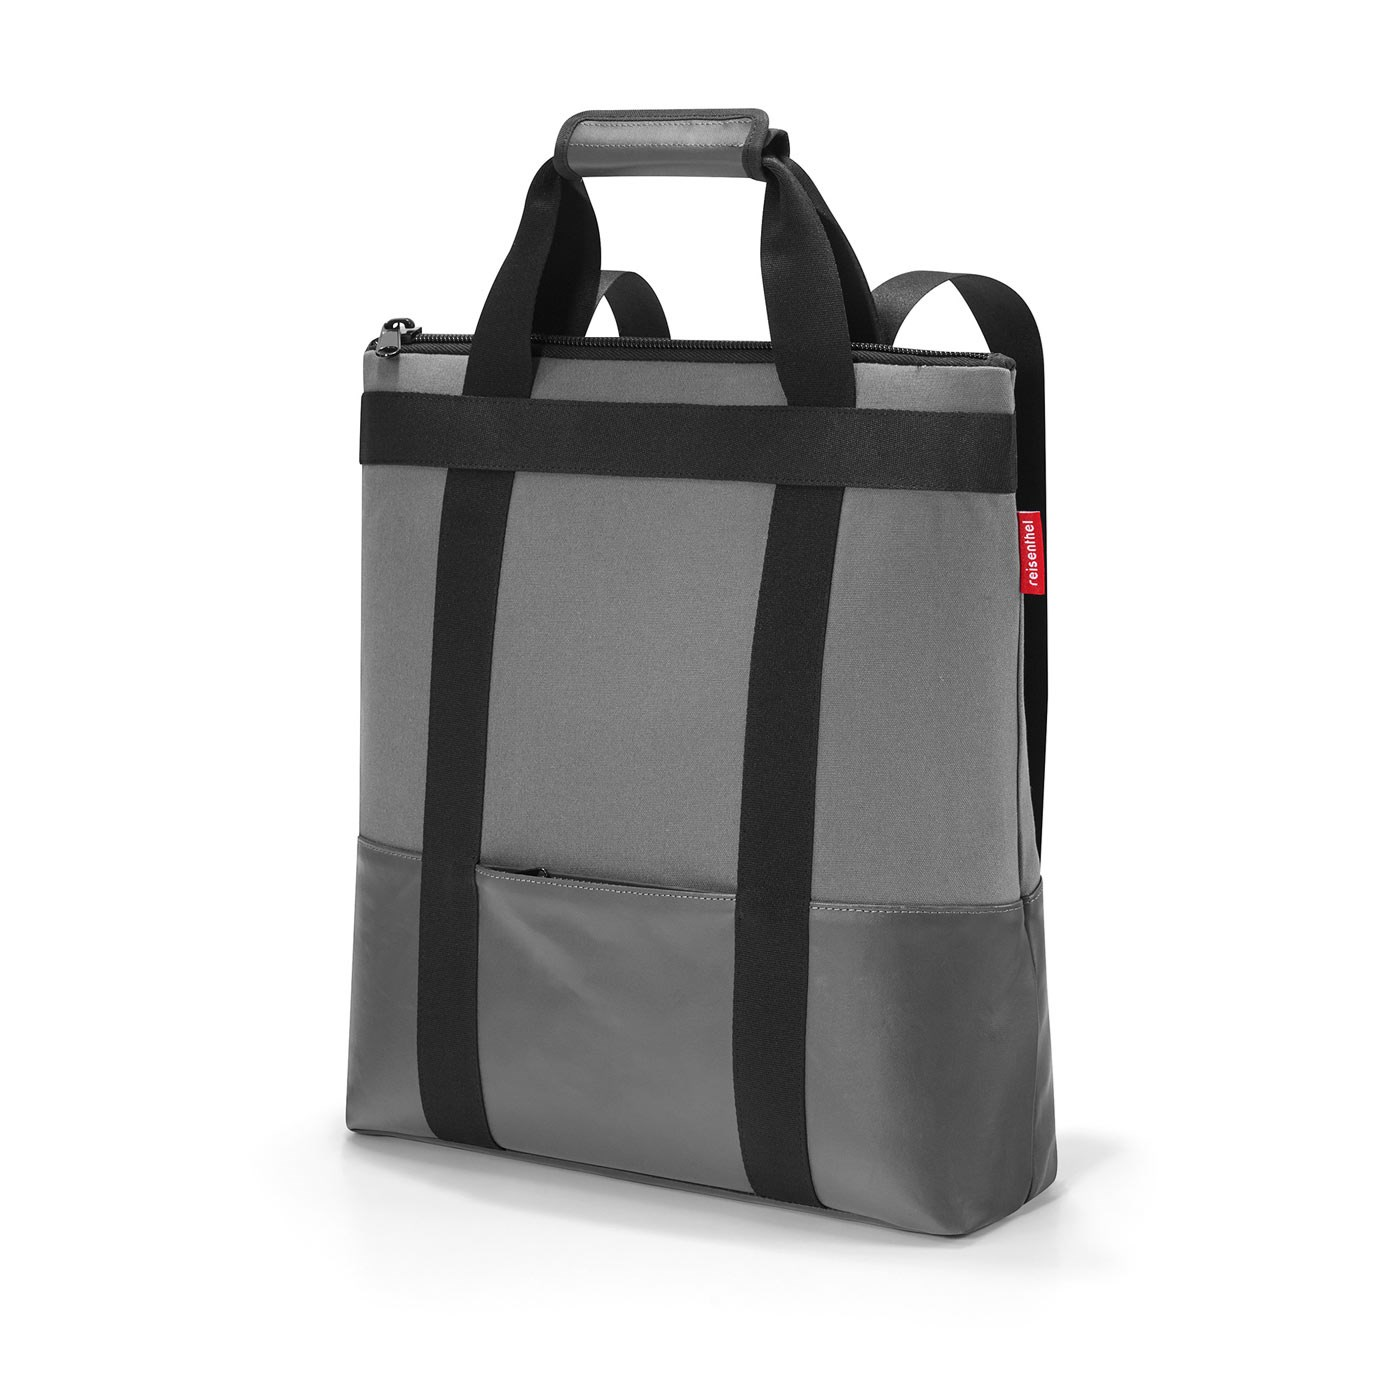 Taška/batoh Daypack canvas grey_2